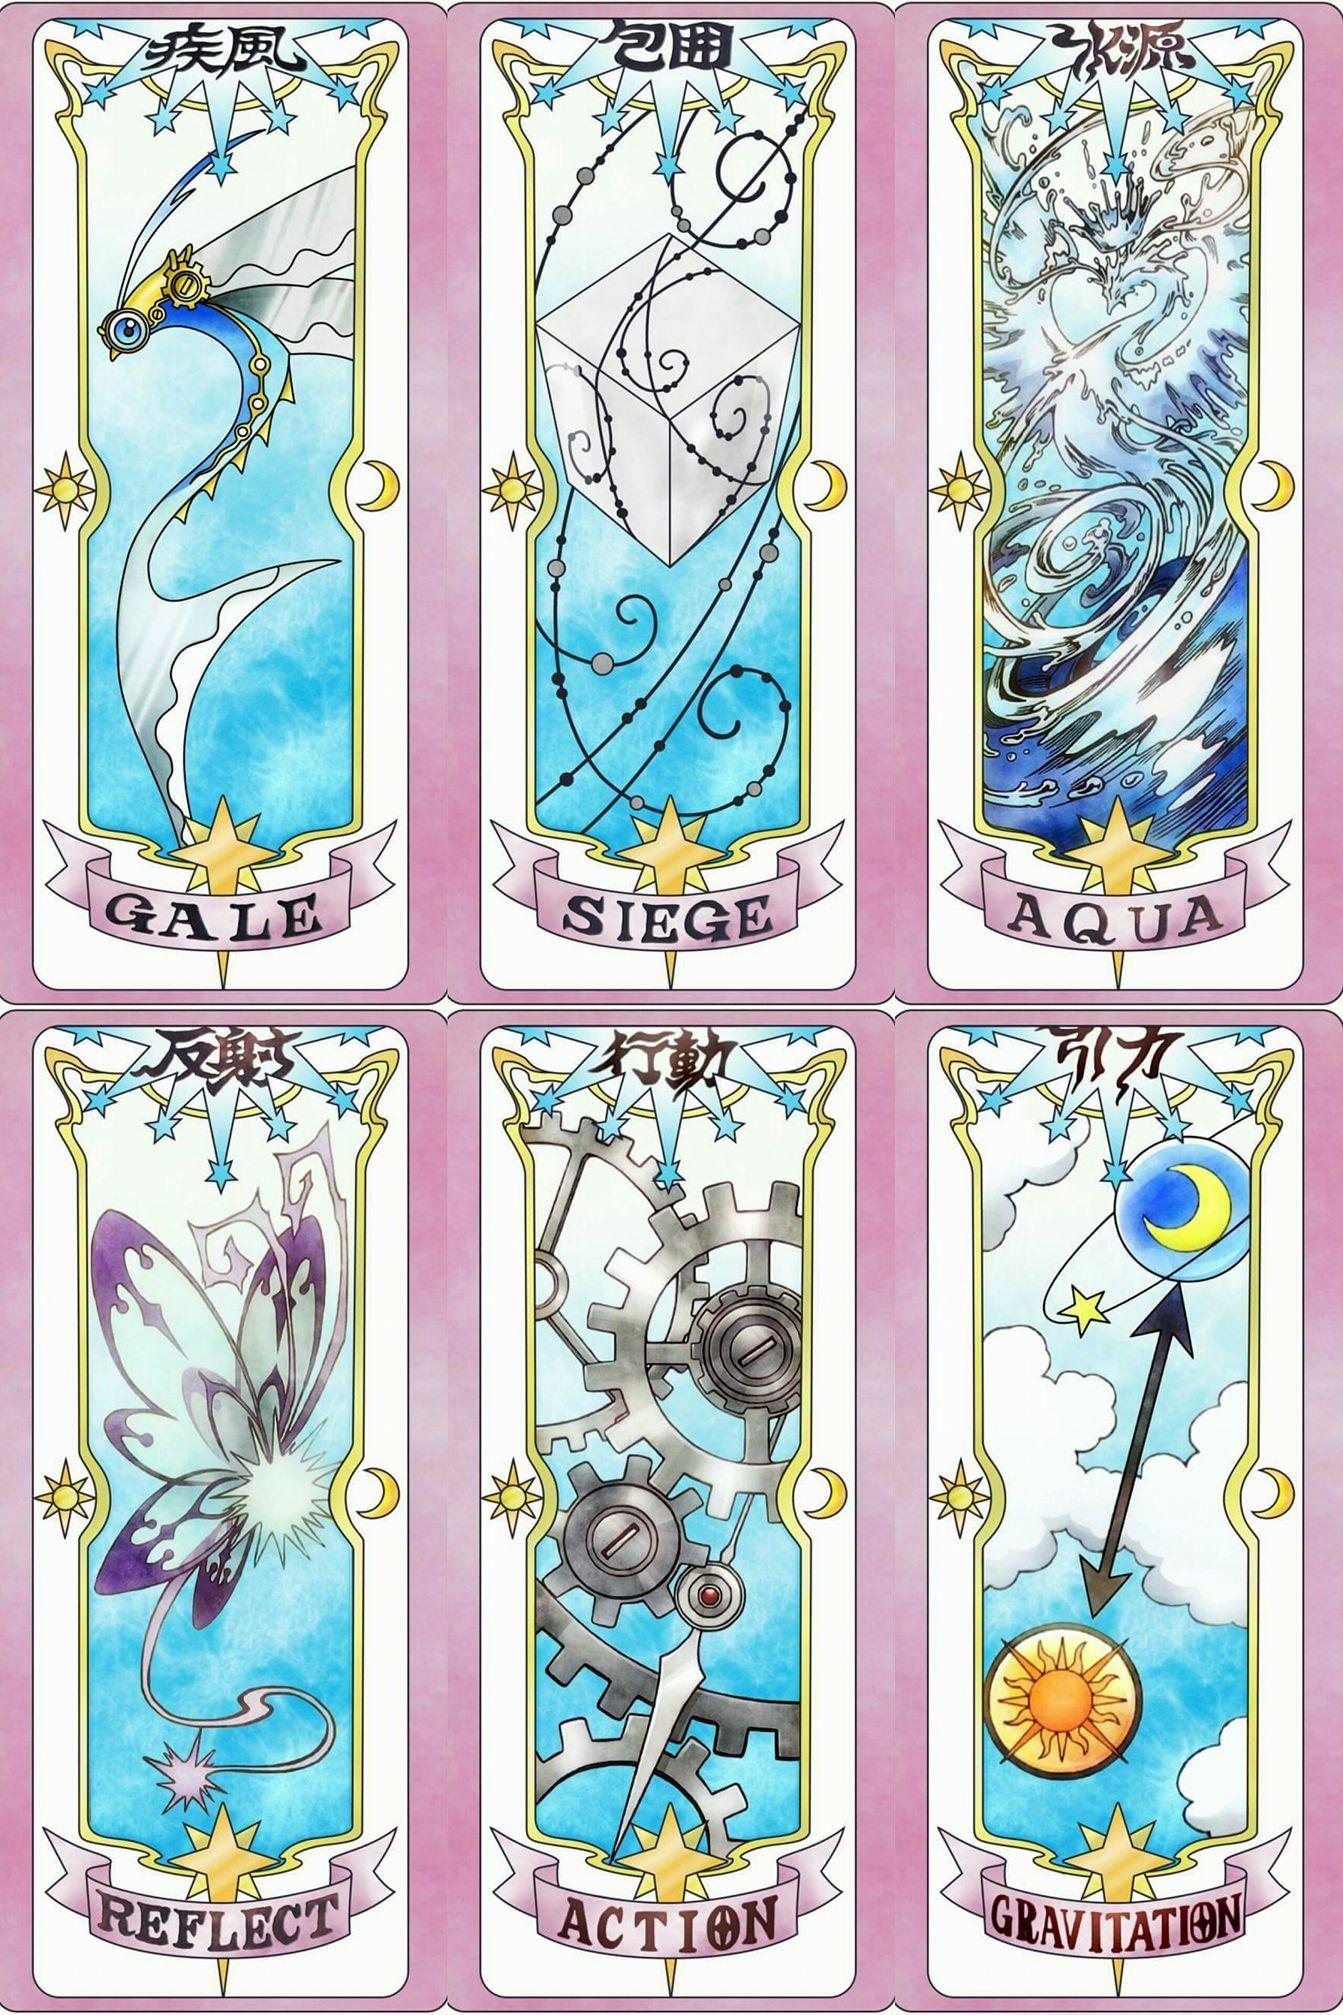 Cardcaptor Sakura Clear Card Season 2 : cardcaptor, sakura, clear, season, Của, Tekachi, Trên, Sakura, Season, Thuật,, Thiệp,, Hoạt, Hình